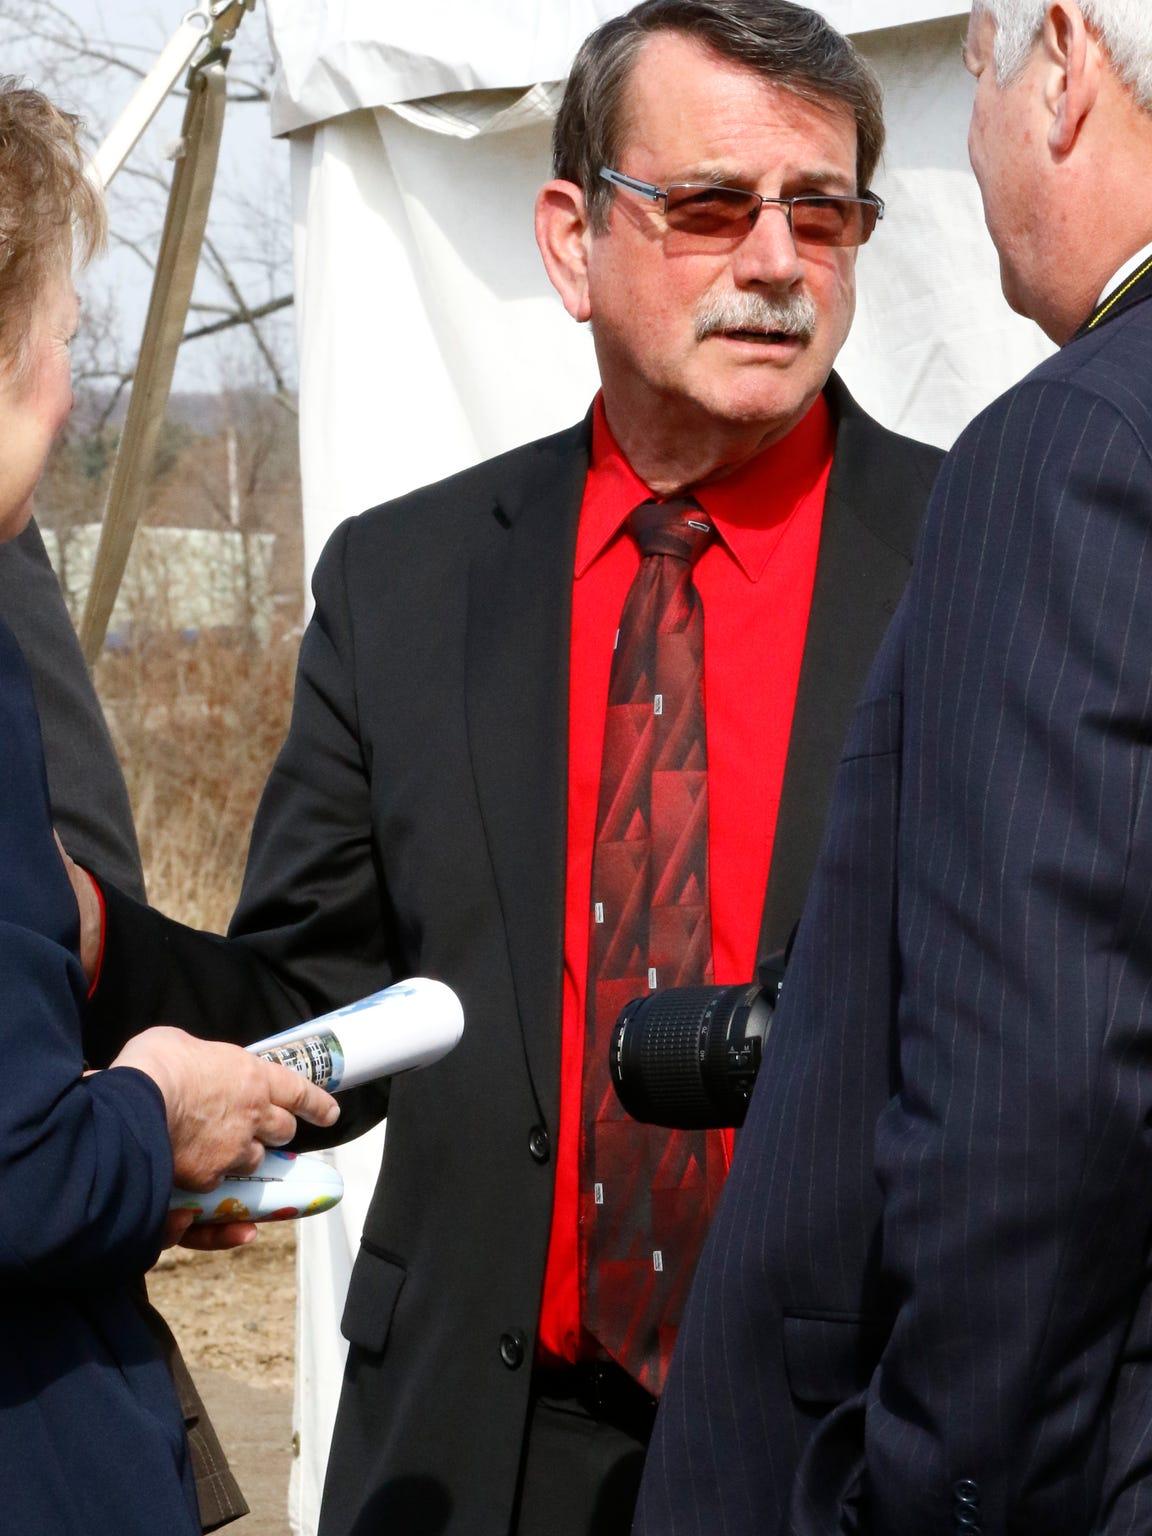 Wausau Mayor Jim Tipple mingles Monday morning, April